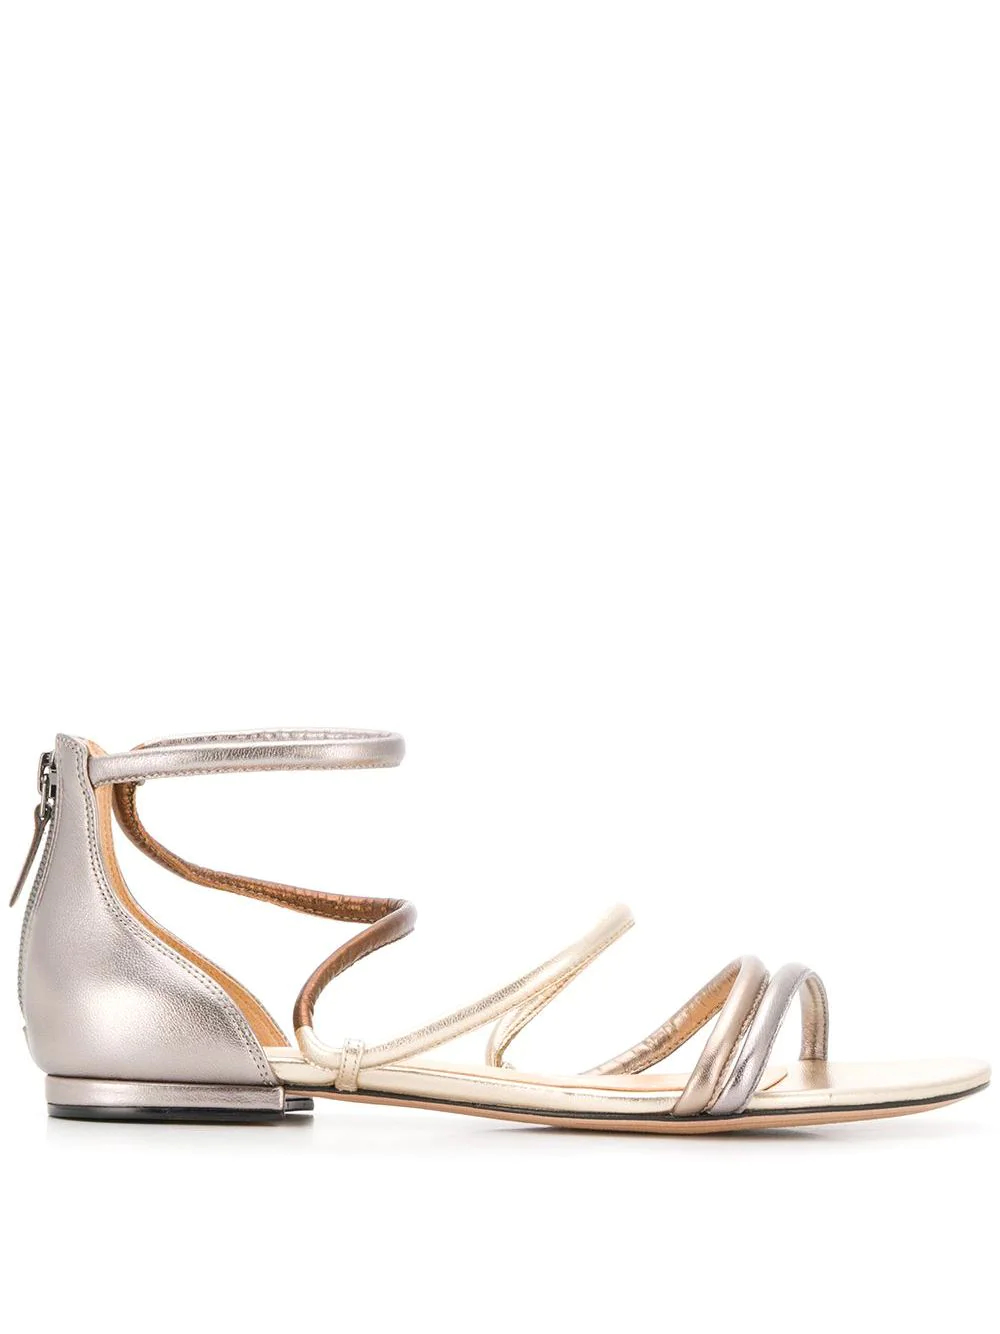 Alexandre Birman | сандалии с ремешками | Clouty